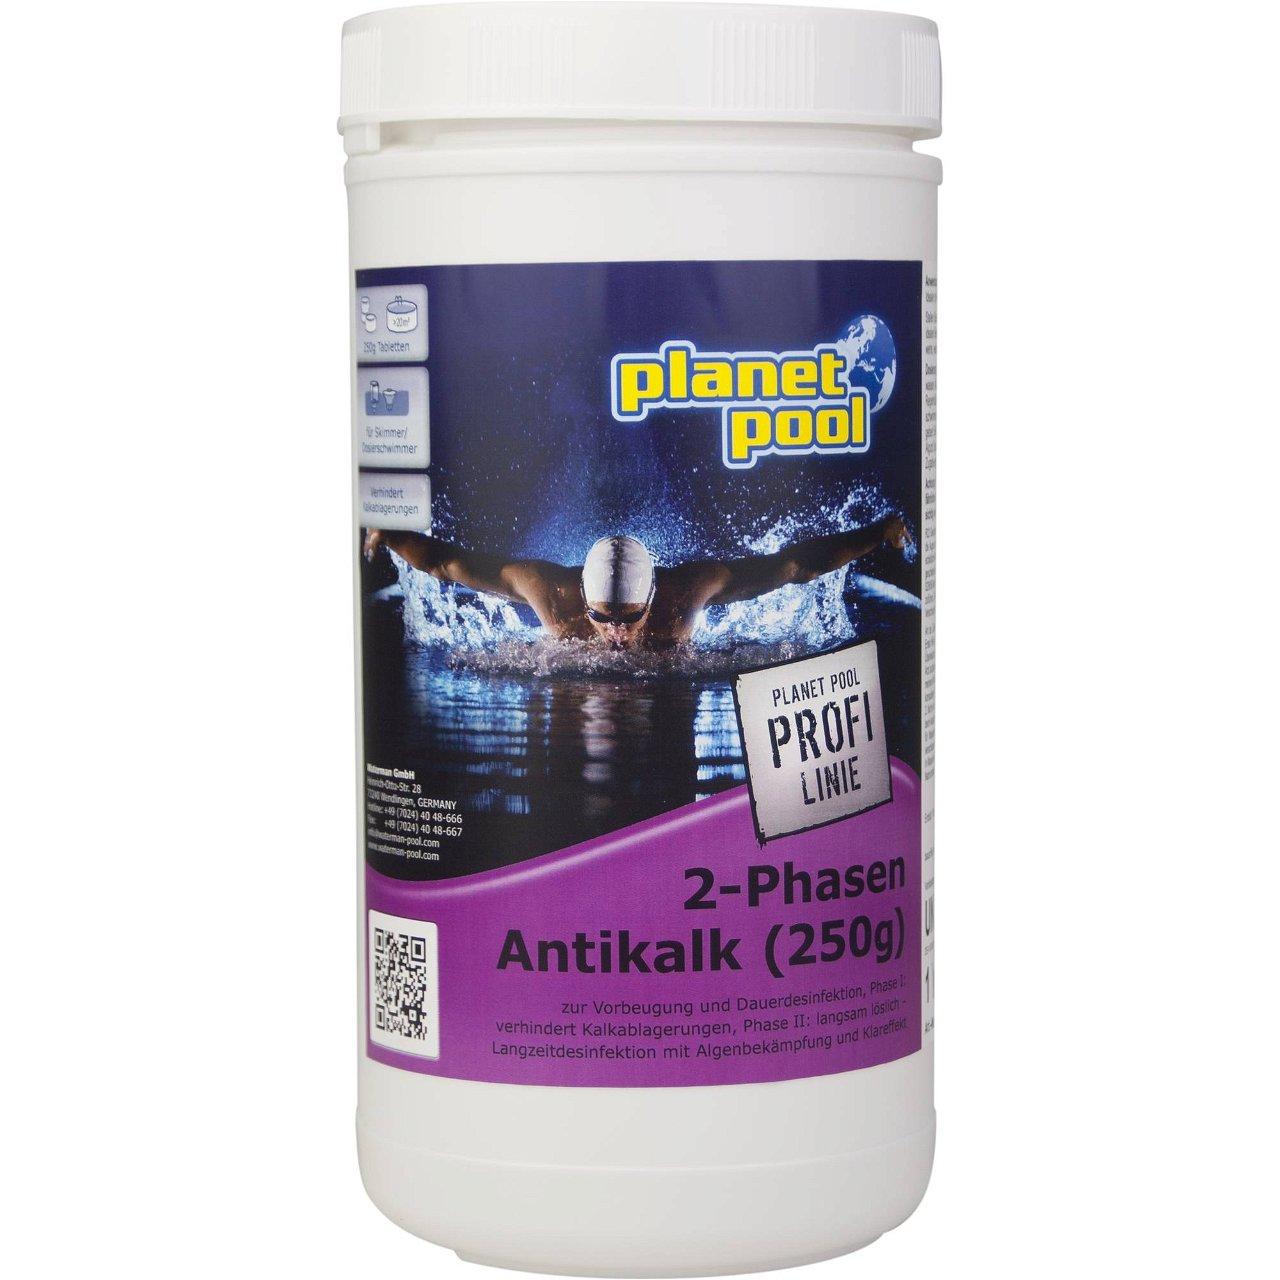 PLANET POOL - Profi Linie    2-Phasen Antikalk Tabletten 1 kg